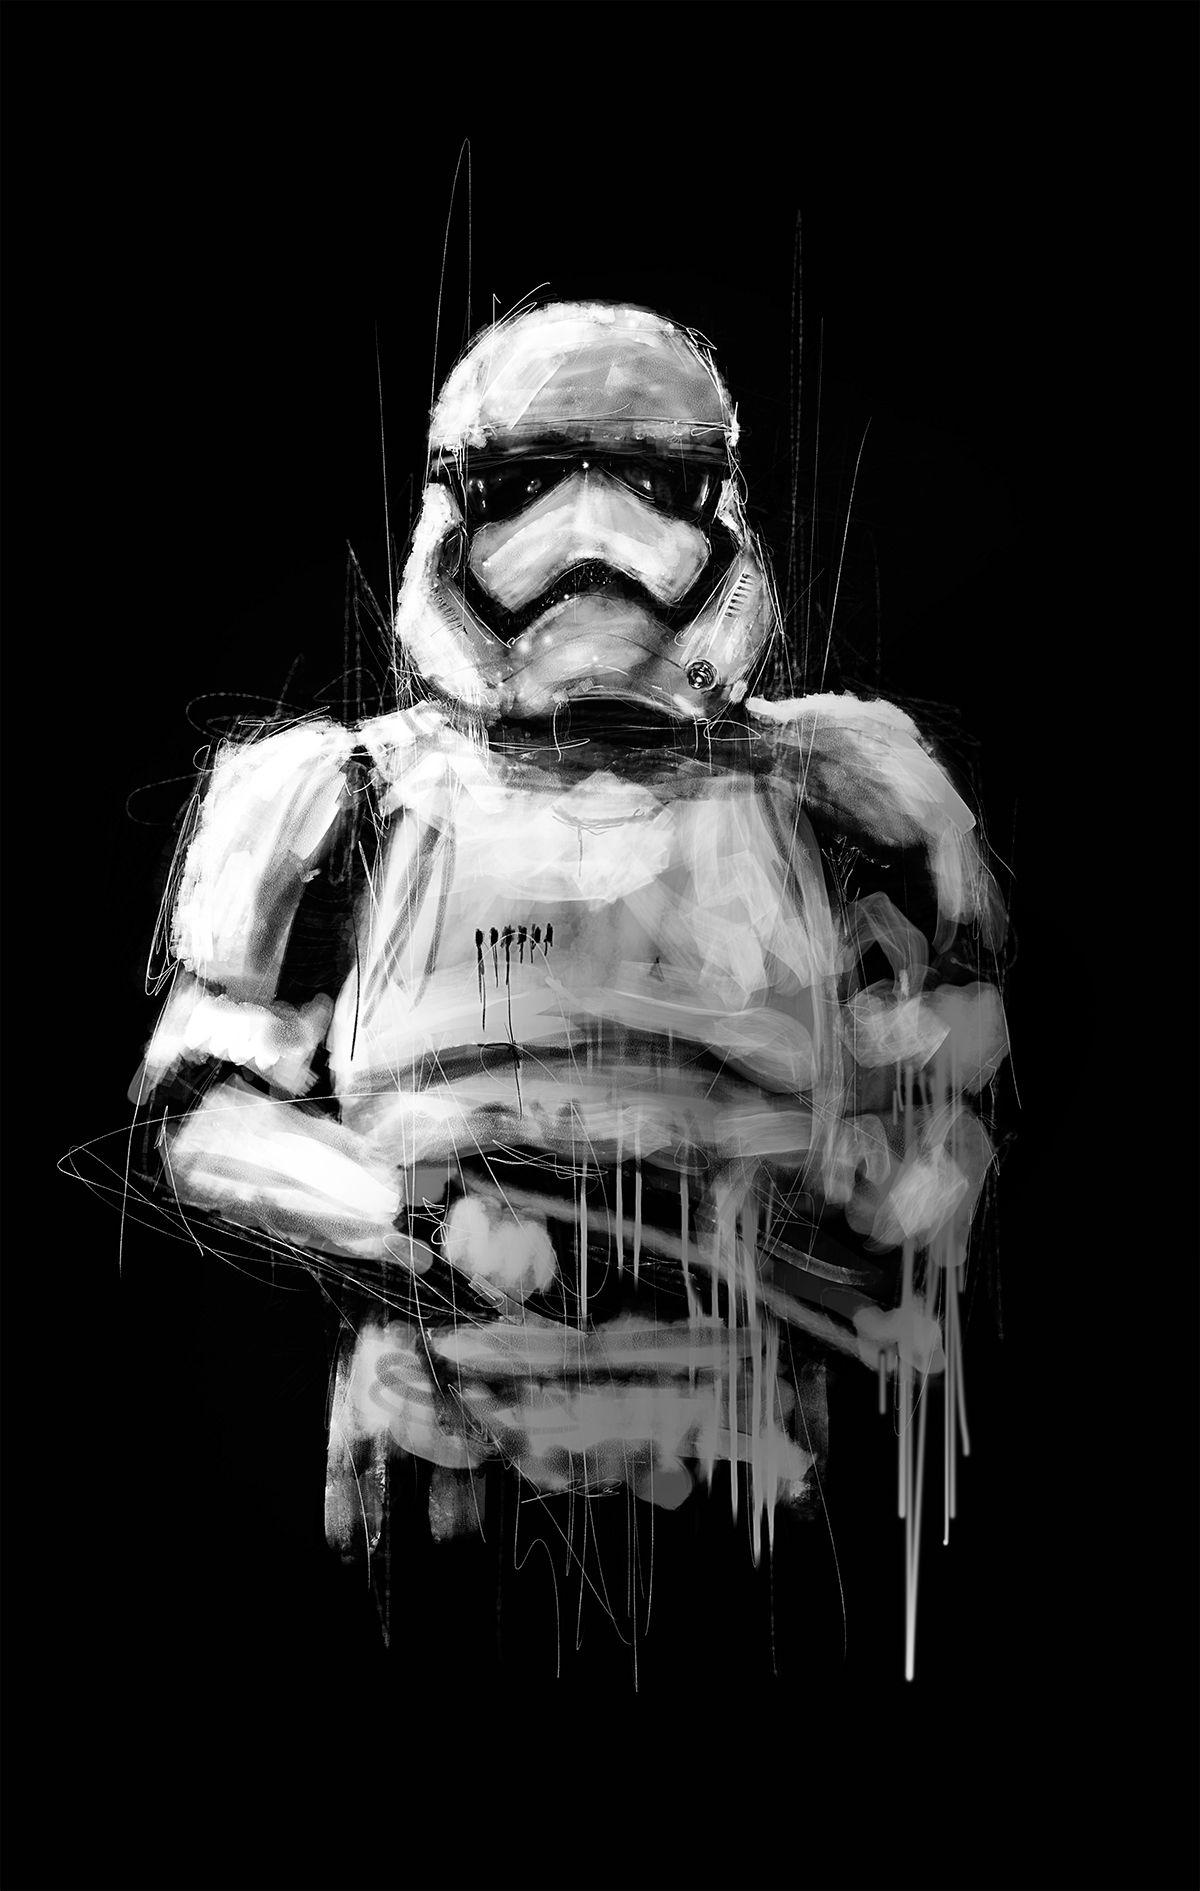 Star Wars Portraits On Behance Star Wars Wallpaper Star Wars Portrait